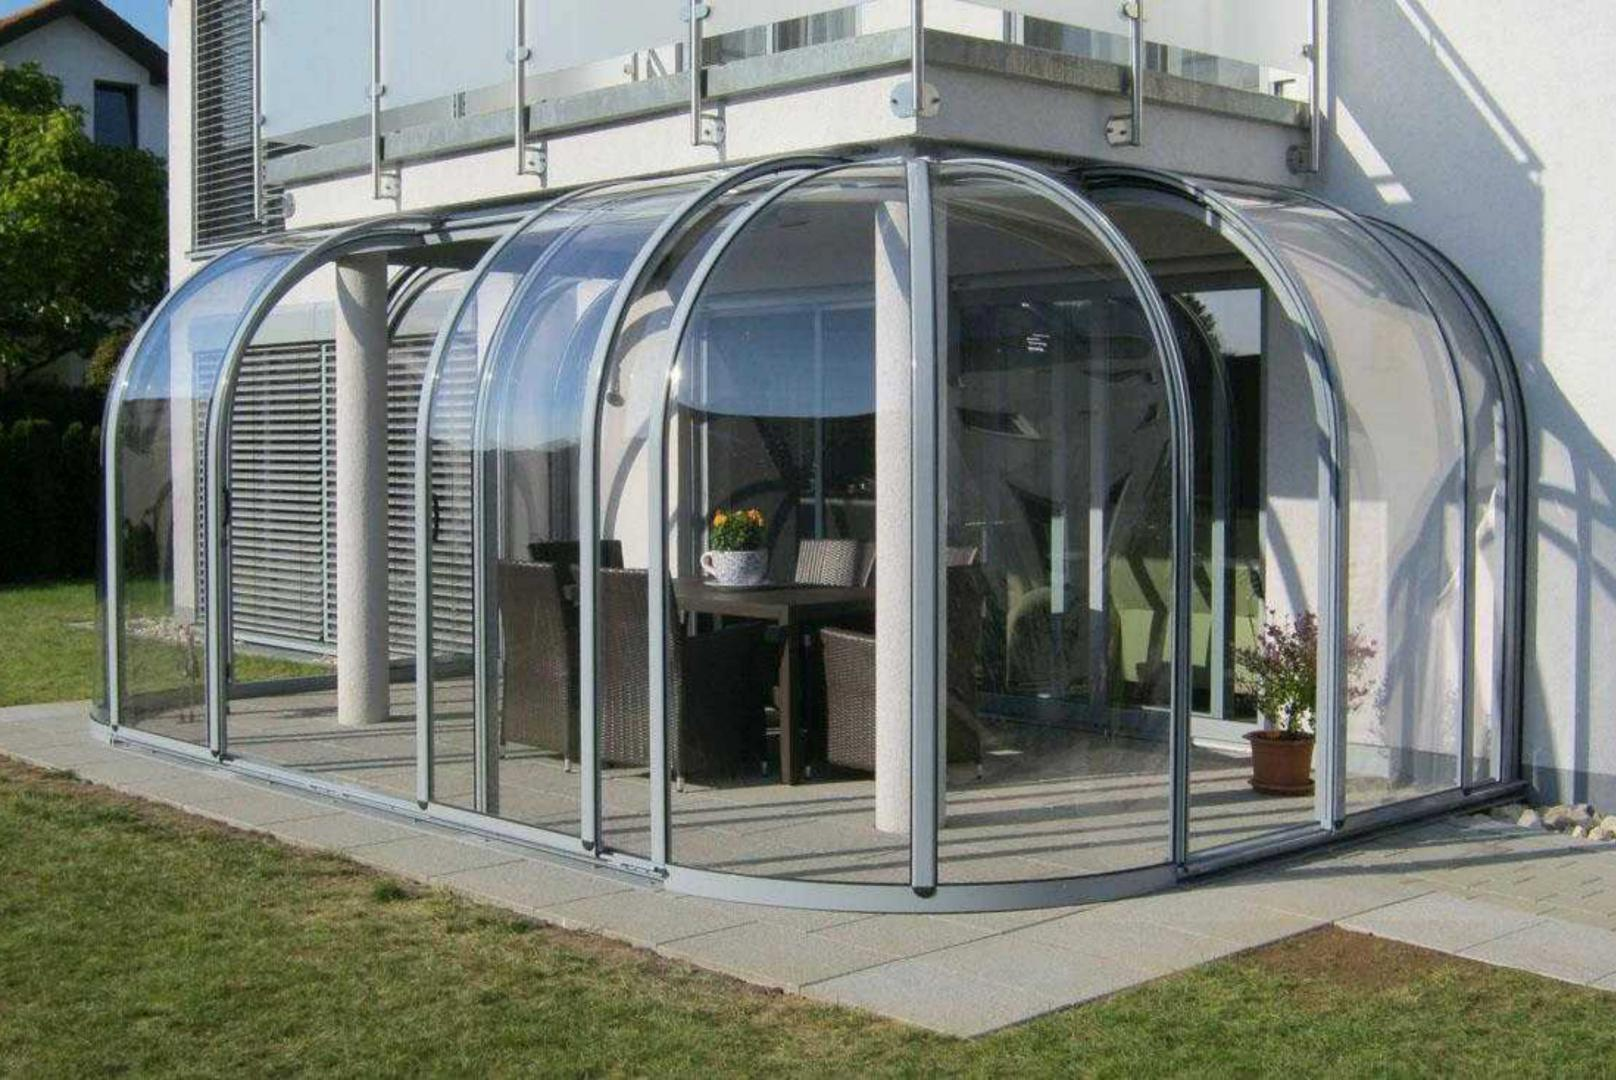 Abri Terrasse Perle Solar V Randa Bioclimatique